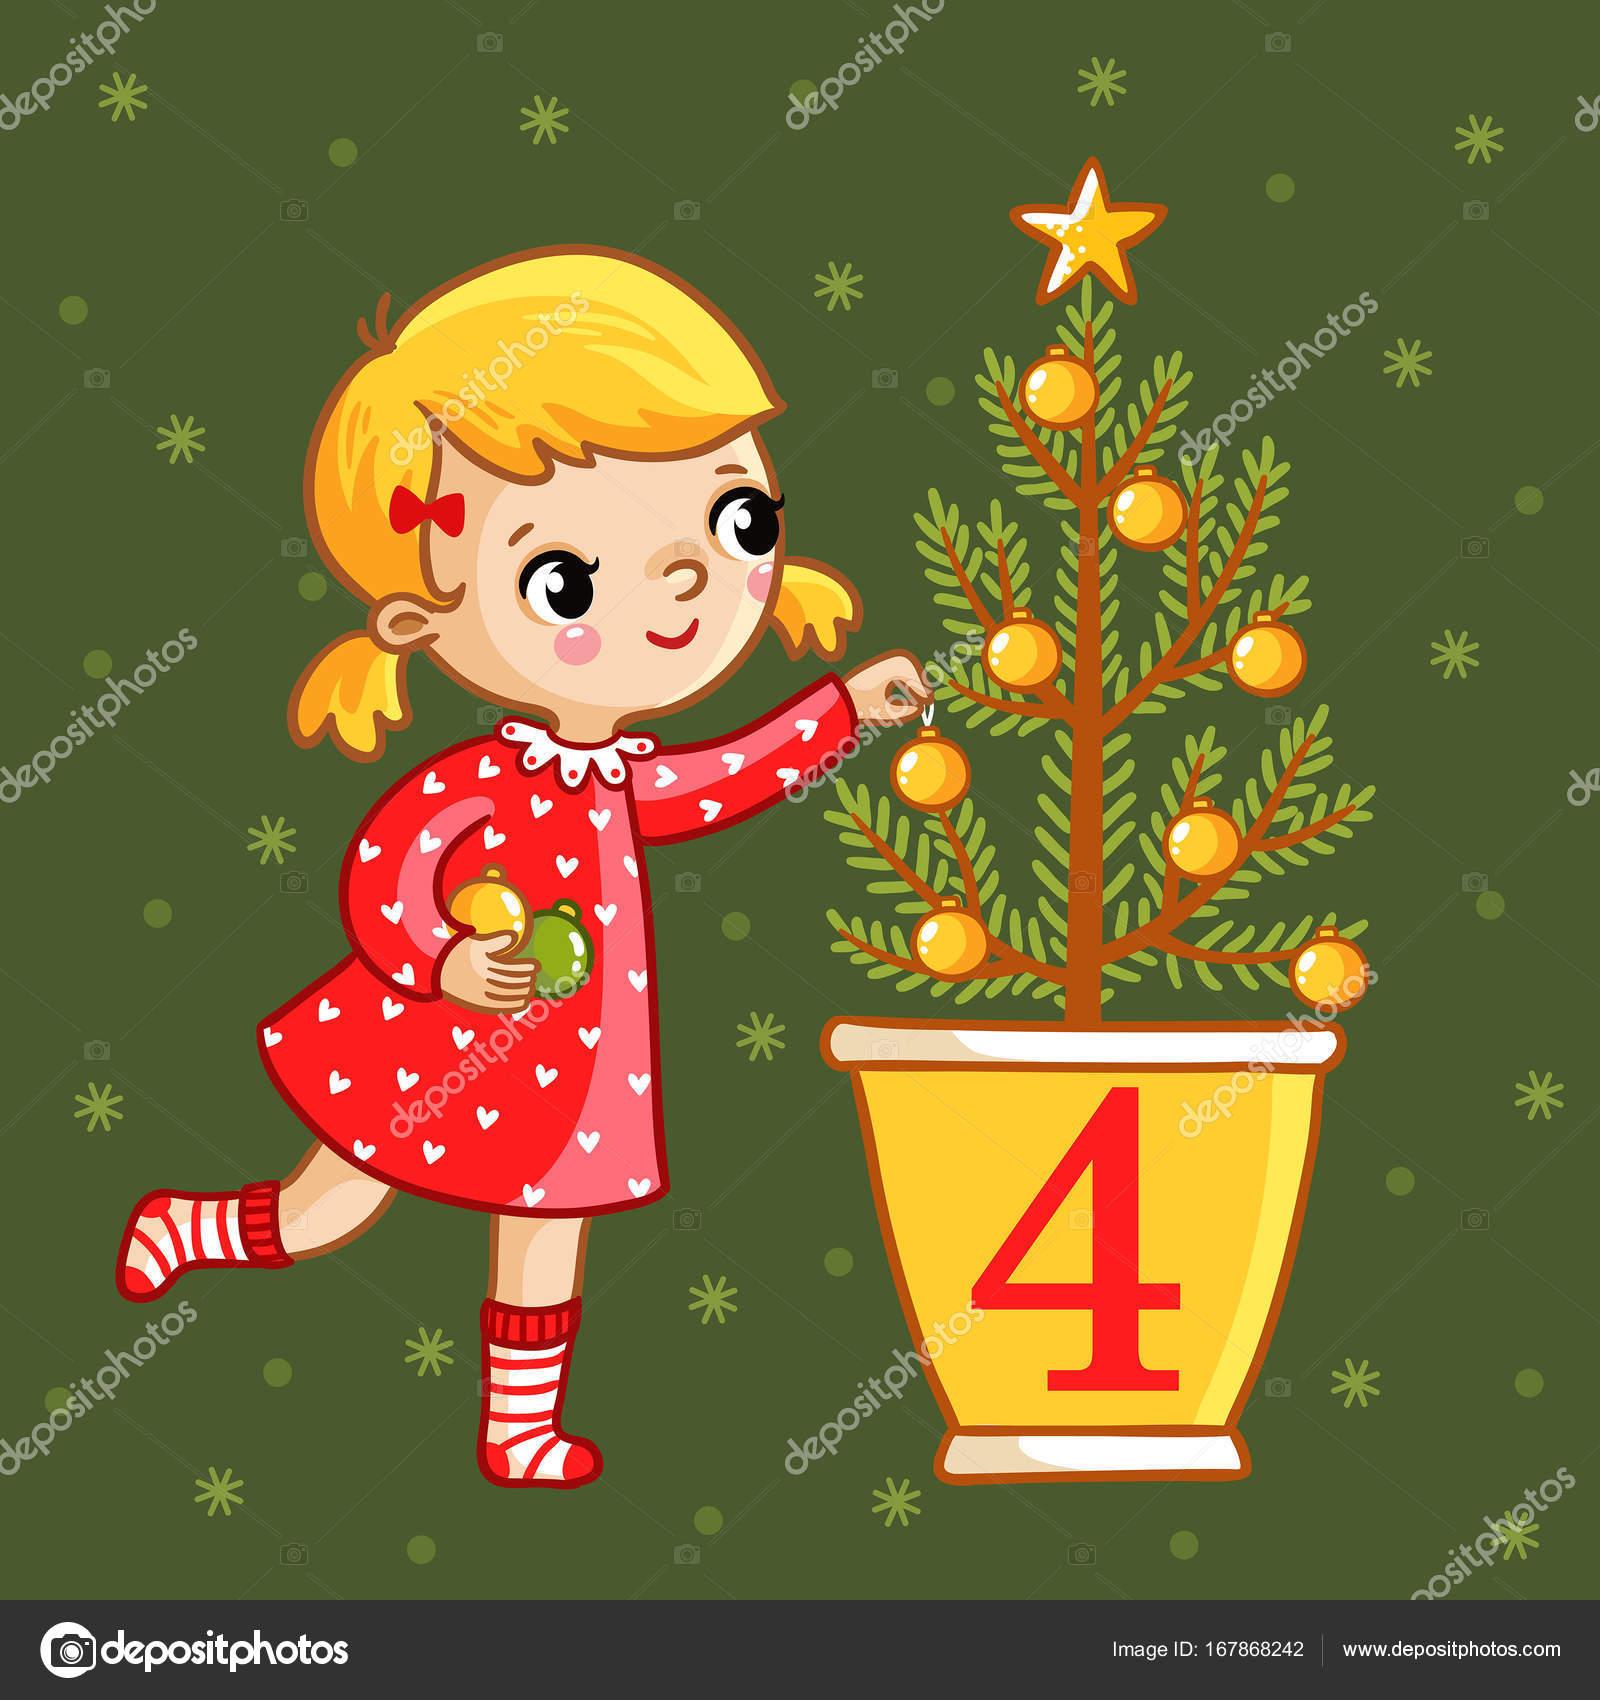 Calendario Di Avvento Per Bambini.Illustrazione Avvento Bambini Calendario Dell Avvento